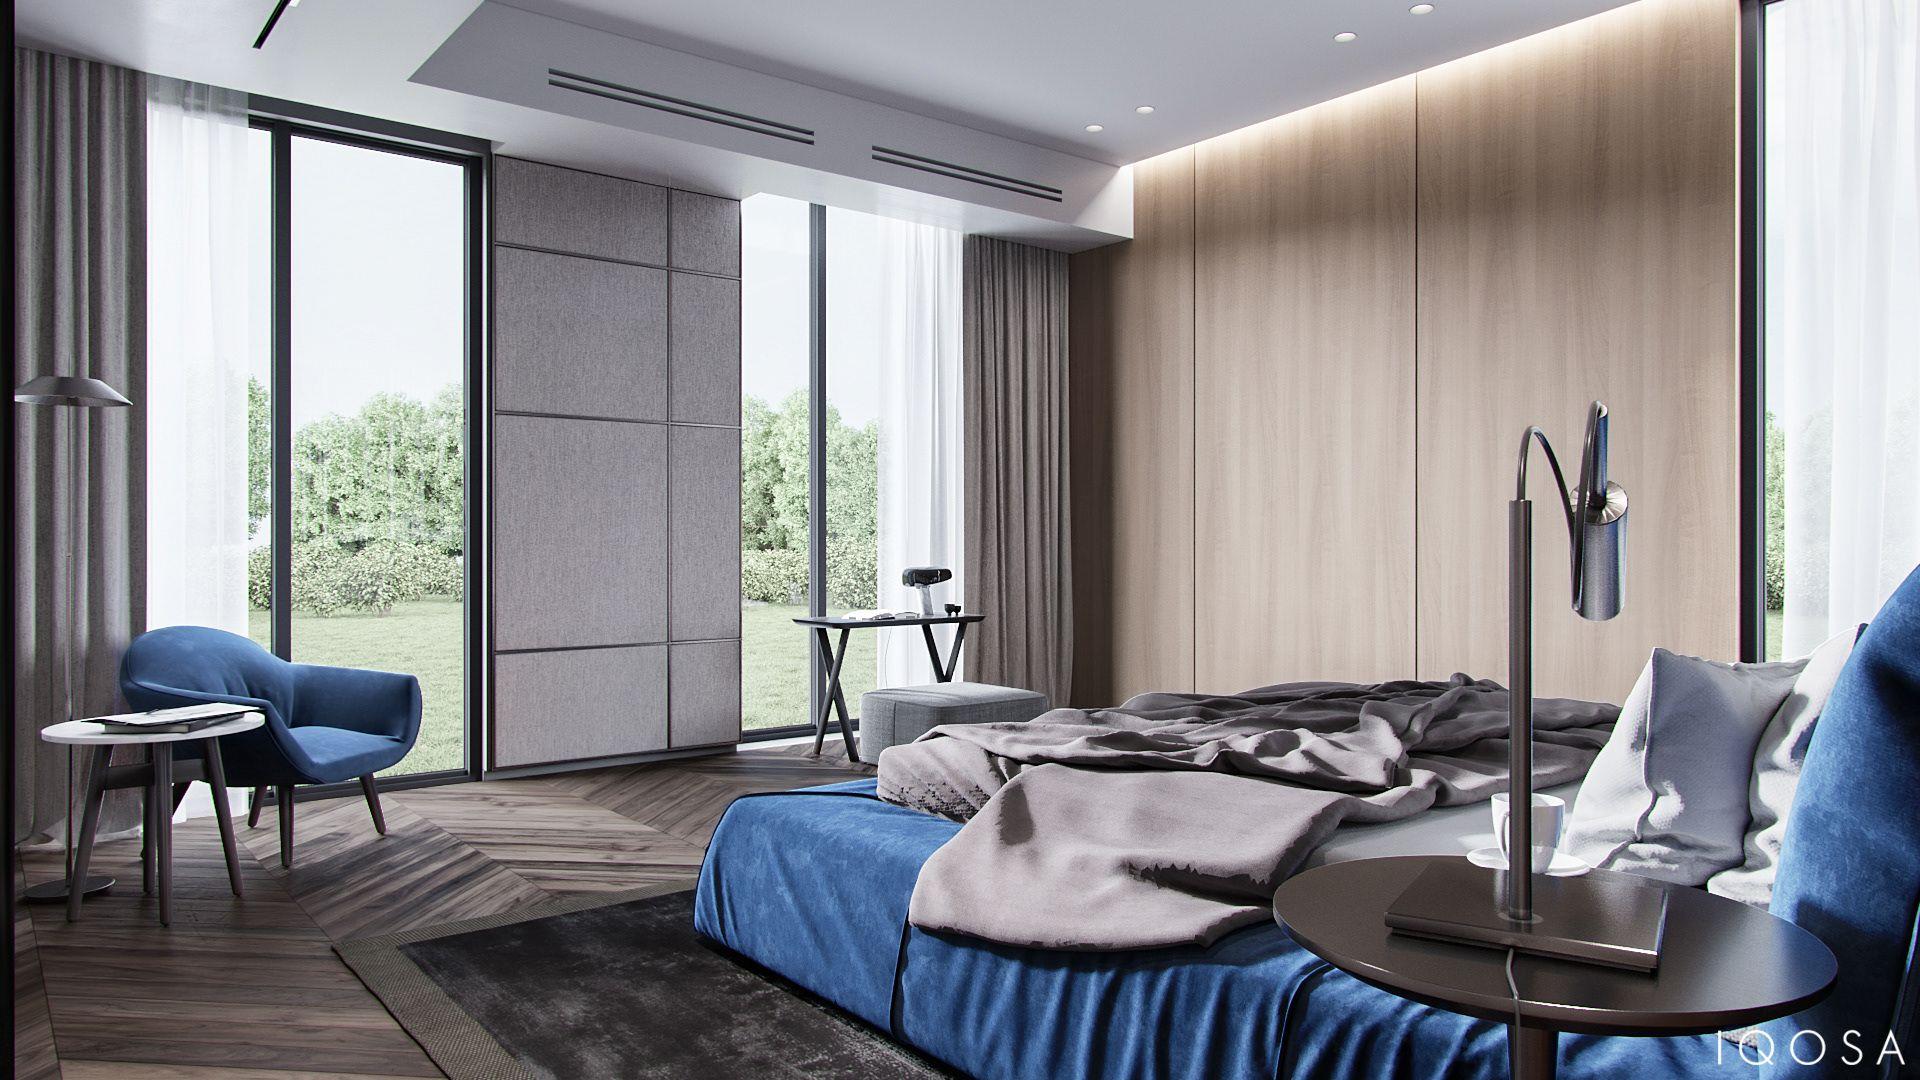 house in riyadh on behance  modern house lobby interior